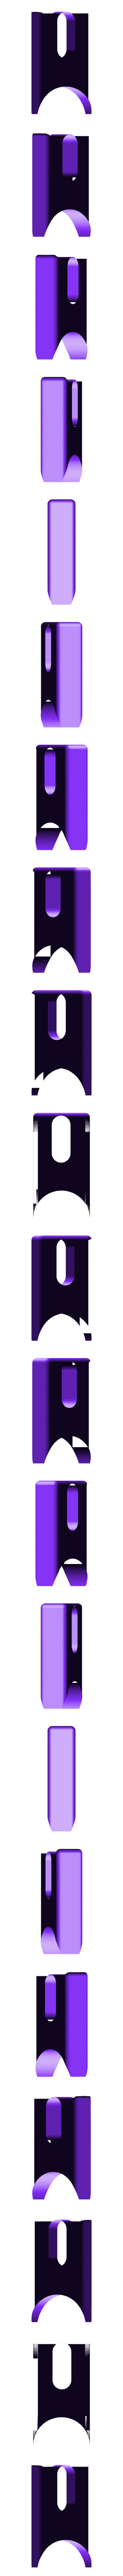 a6_hotend_3.stl Download free STL file Anet A6 J-Hotend mod • 3D printer object, Job